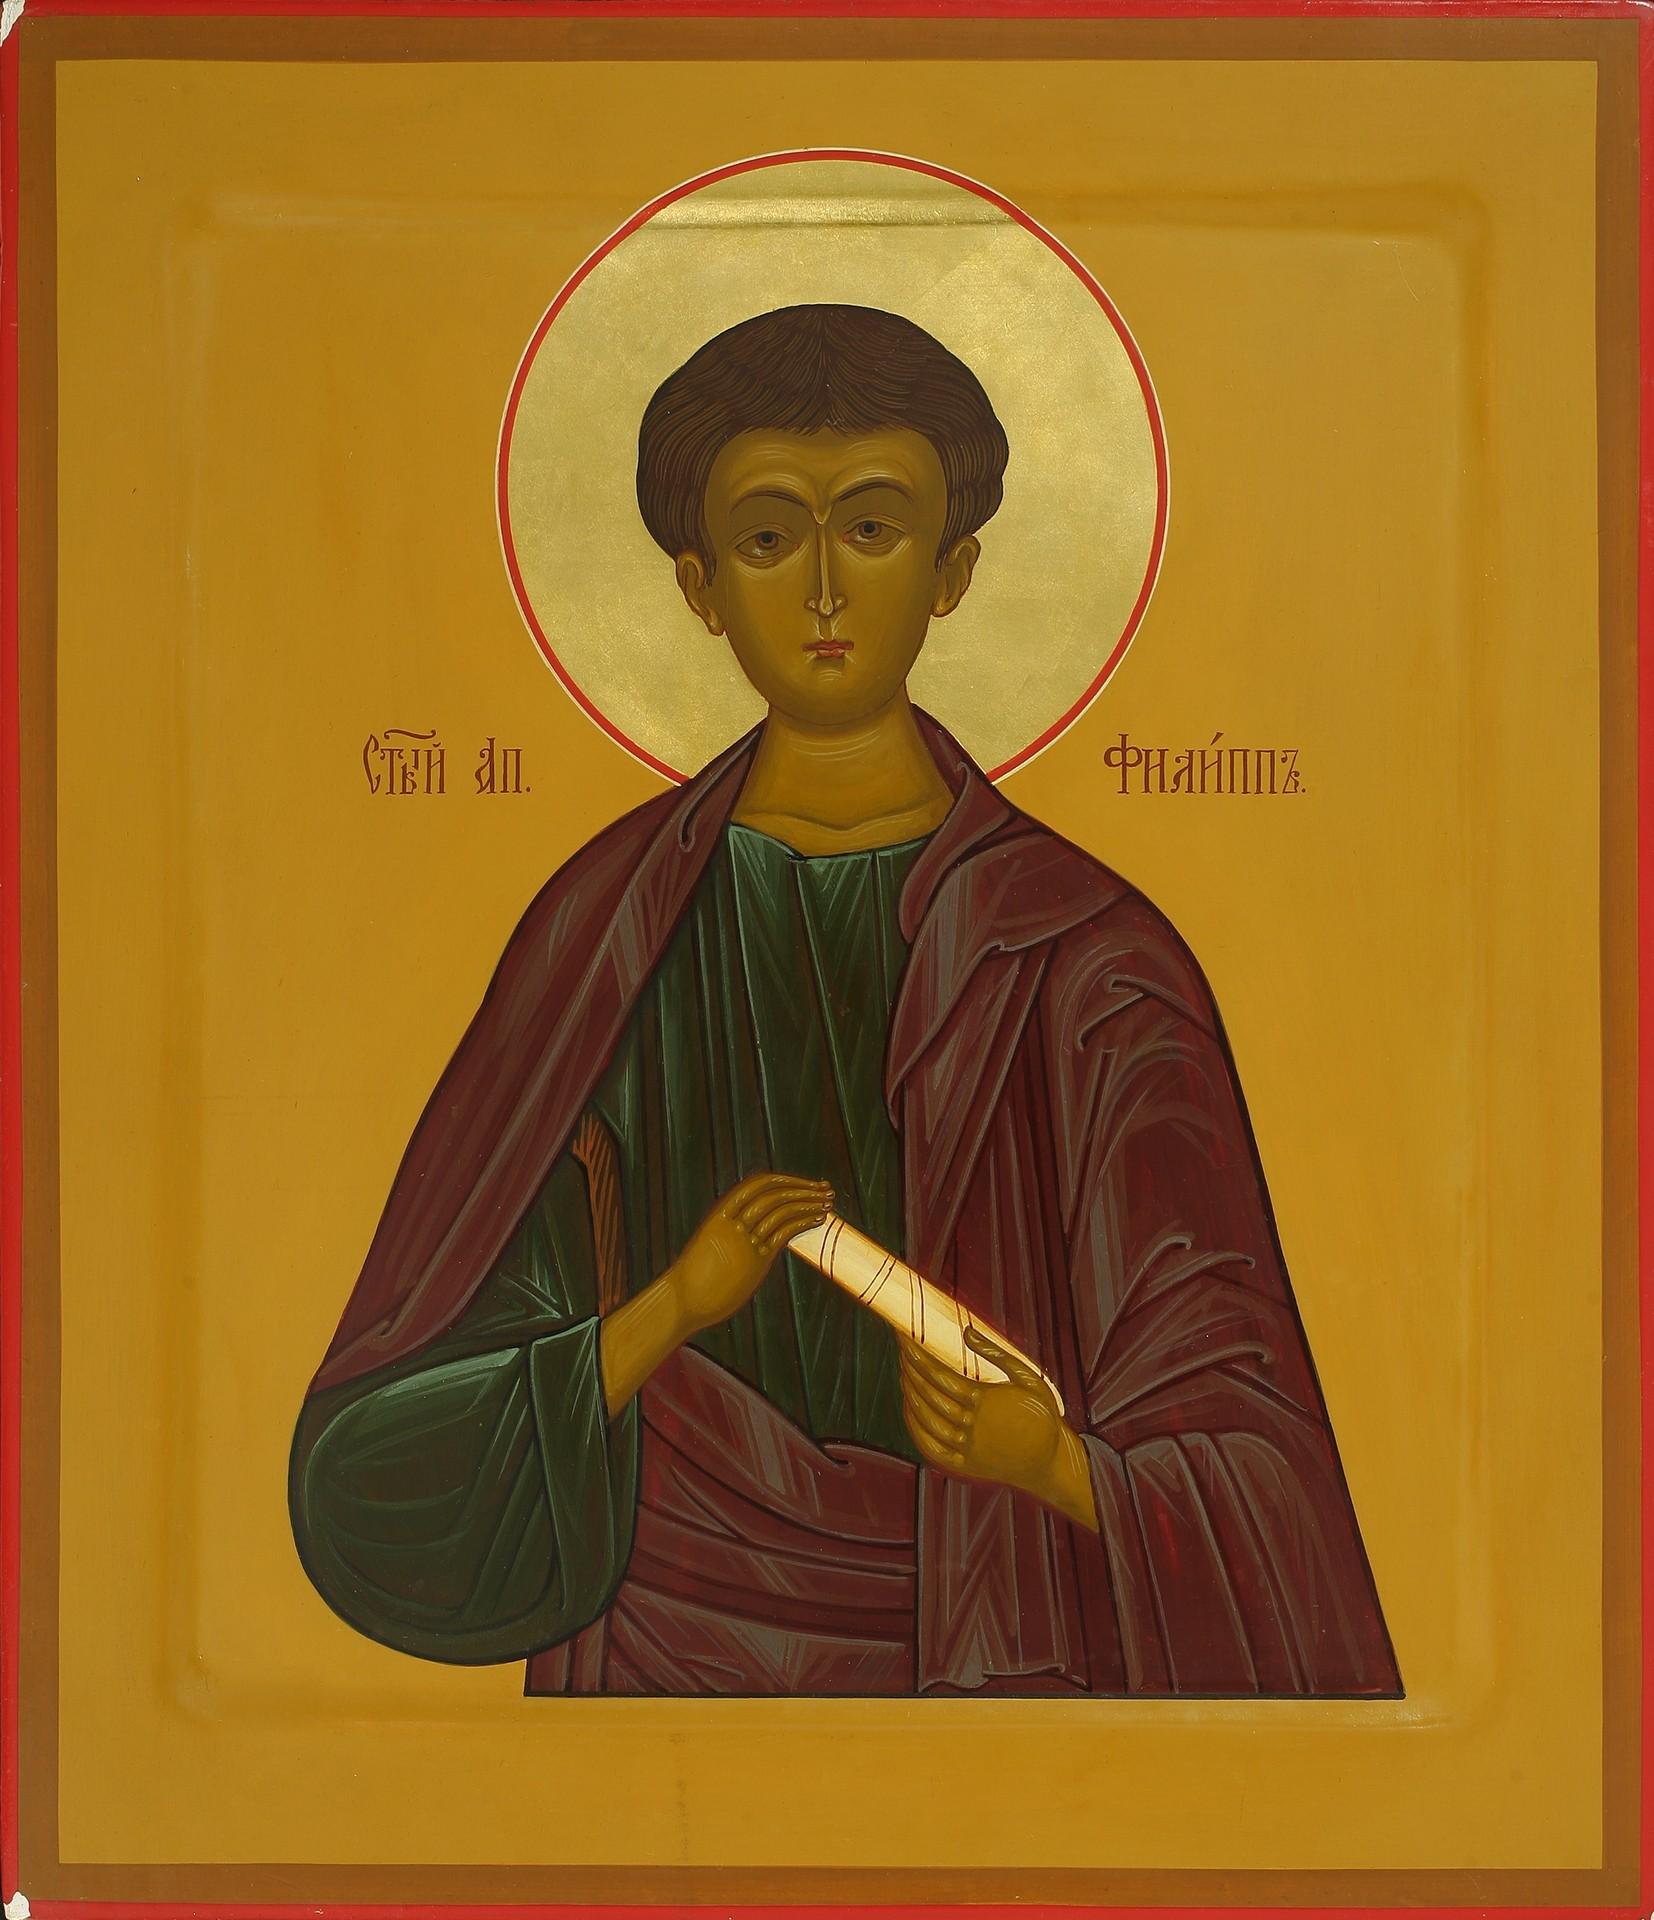 Св. апостол Филипп